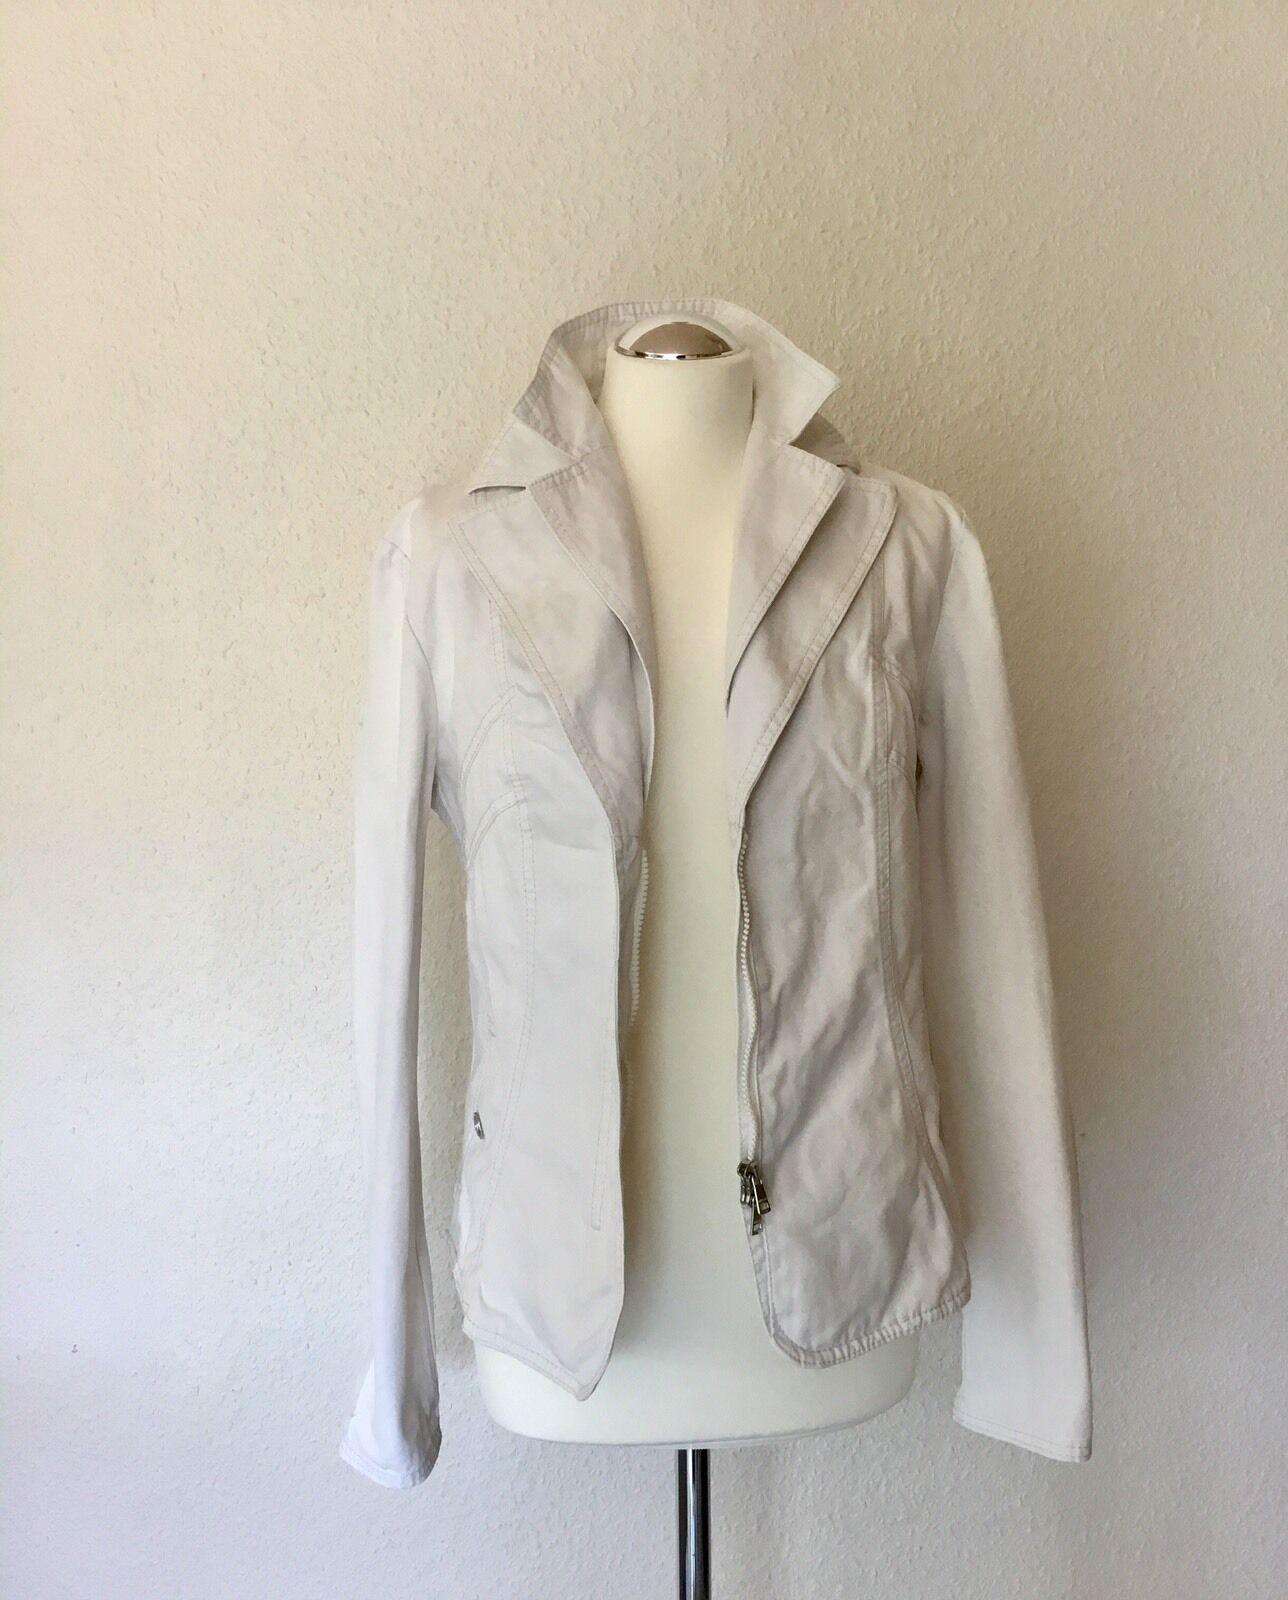 MARCCAIN  SPORTS Jeans Jacke mit RV, Weiß, Größe 40 N4